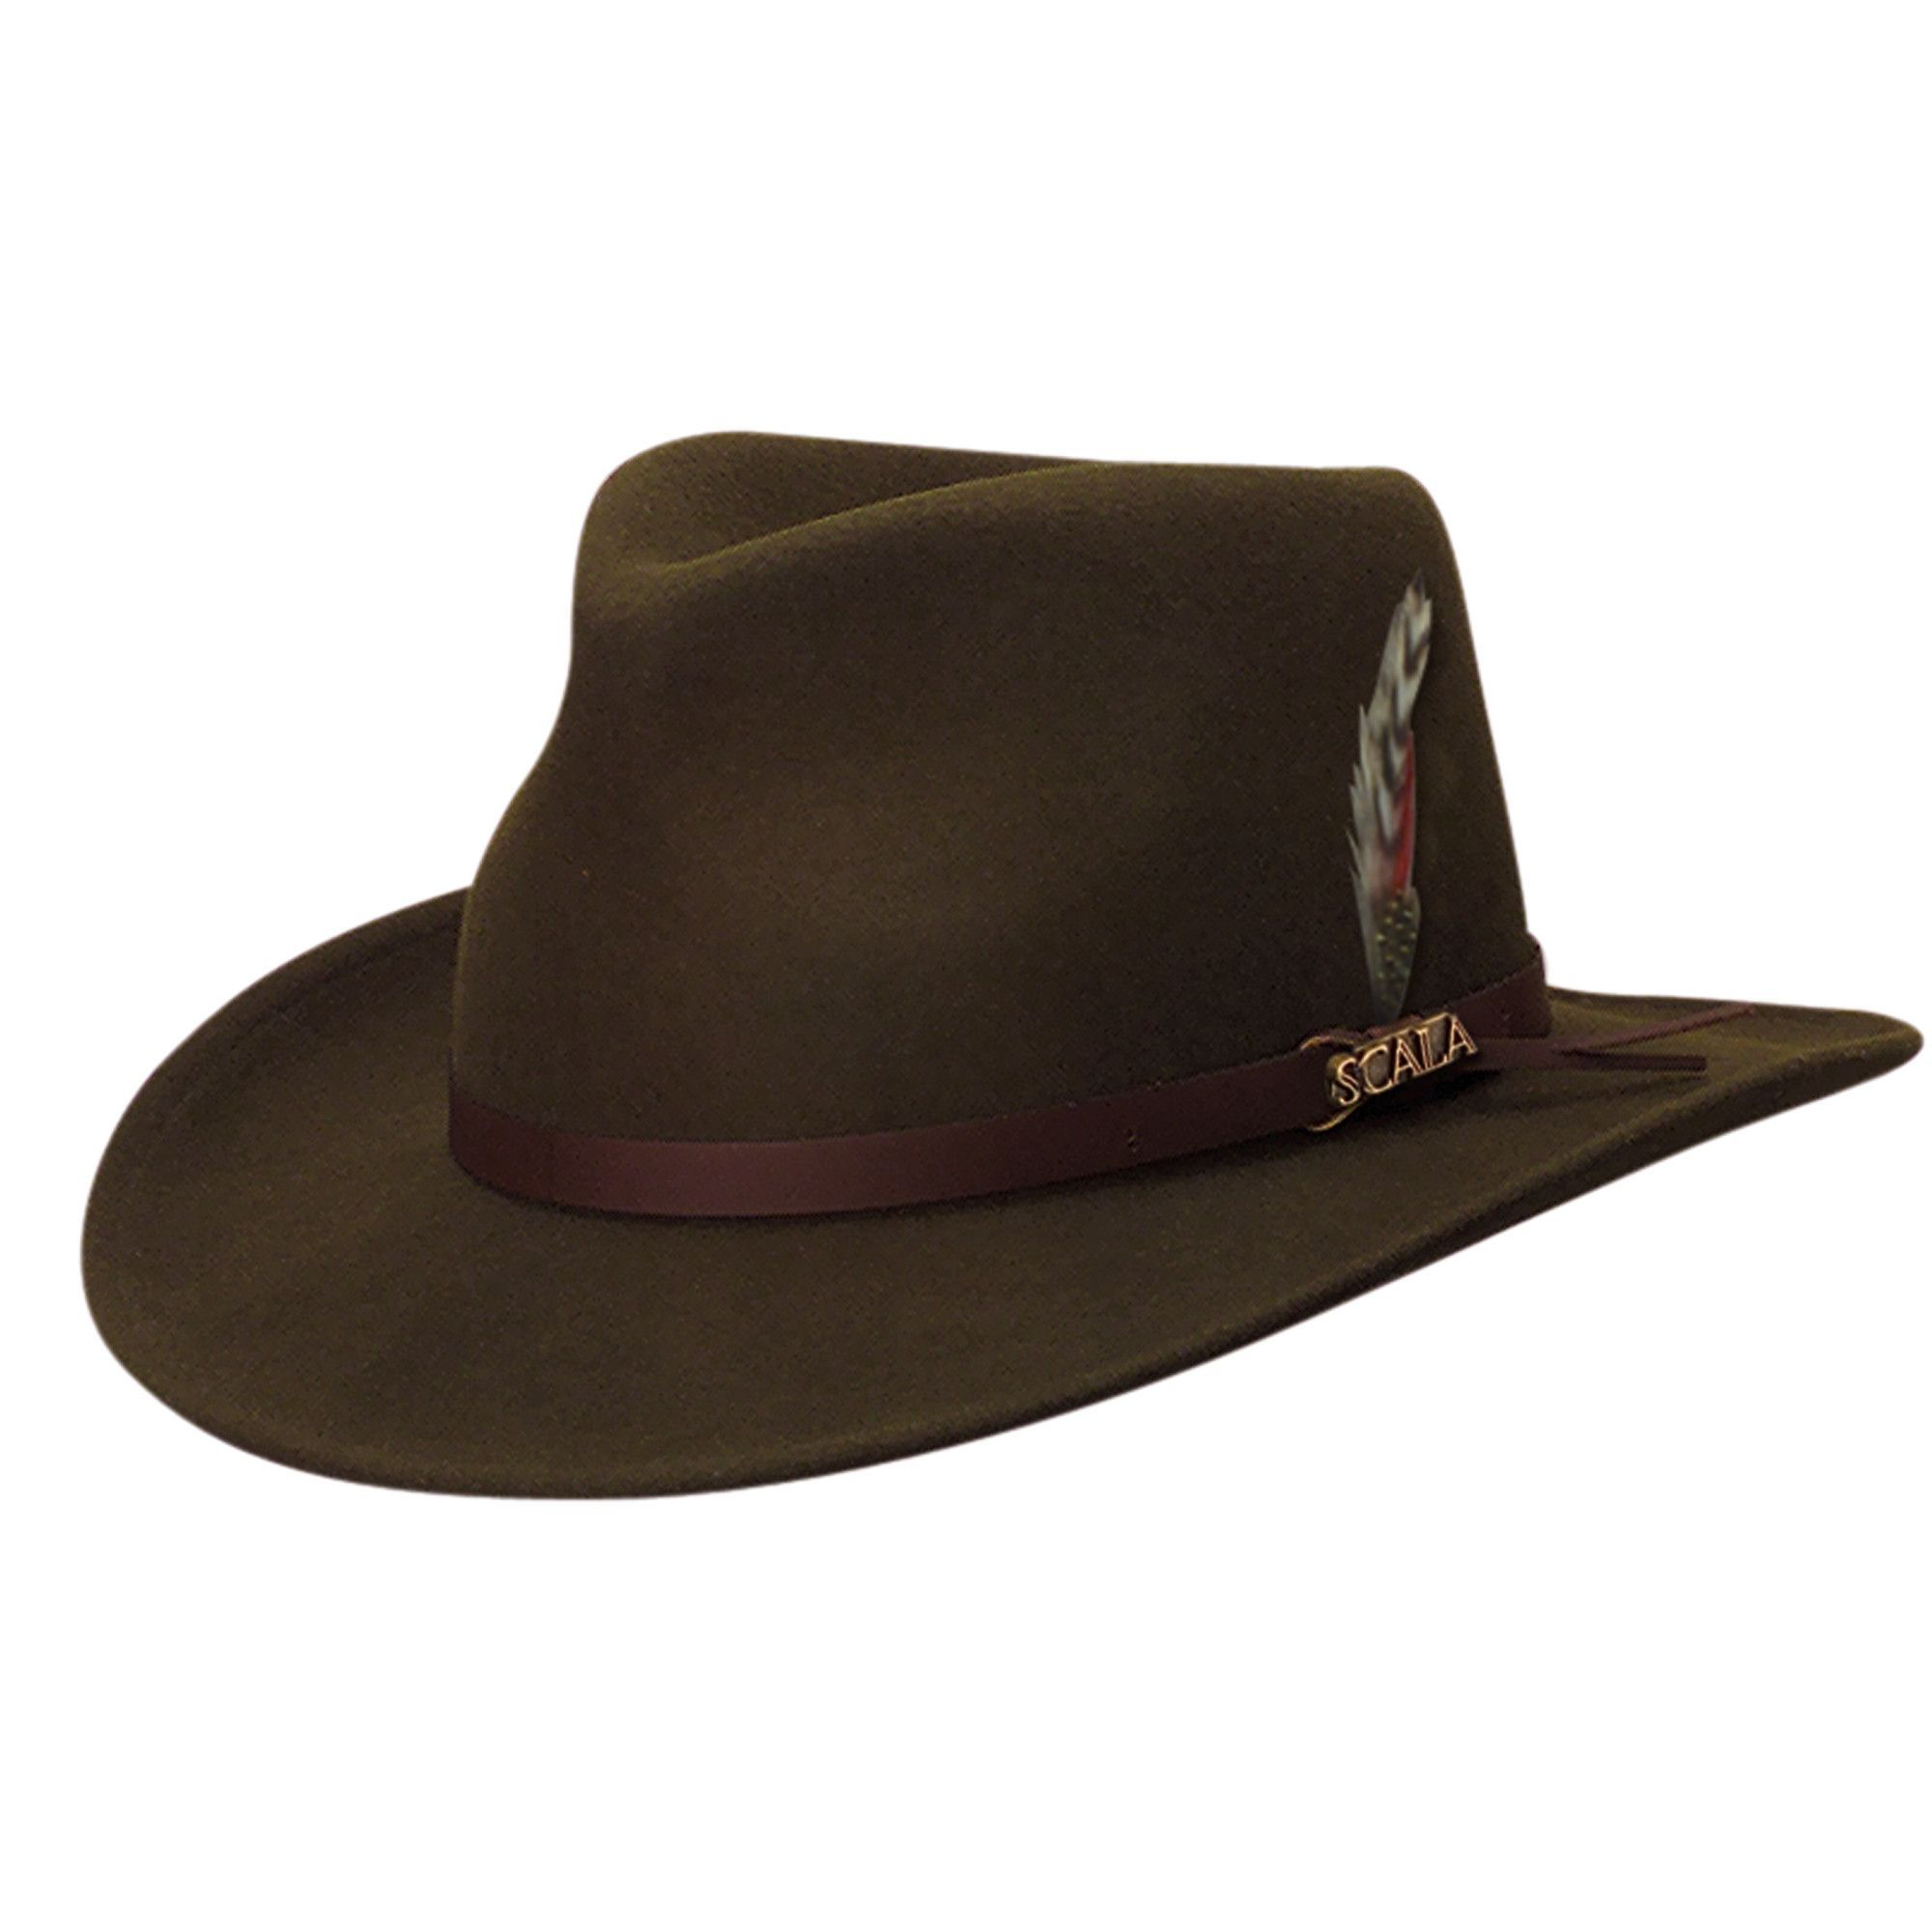 64892e38d9548 Scala Men s Wool Felt Water Repellent Crushable Fedora Hat